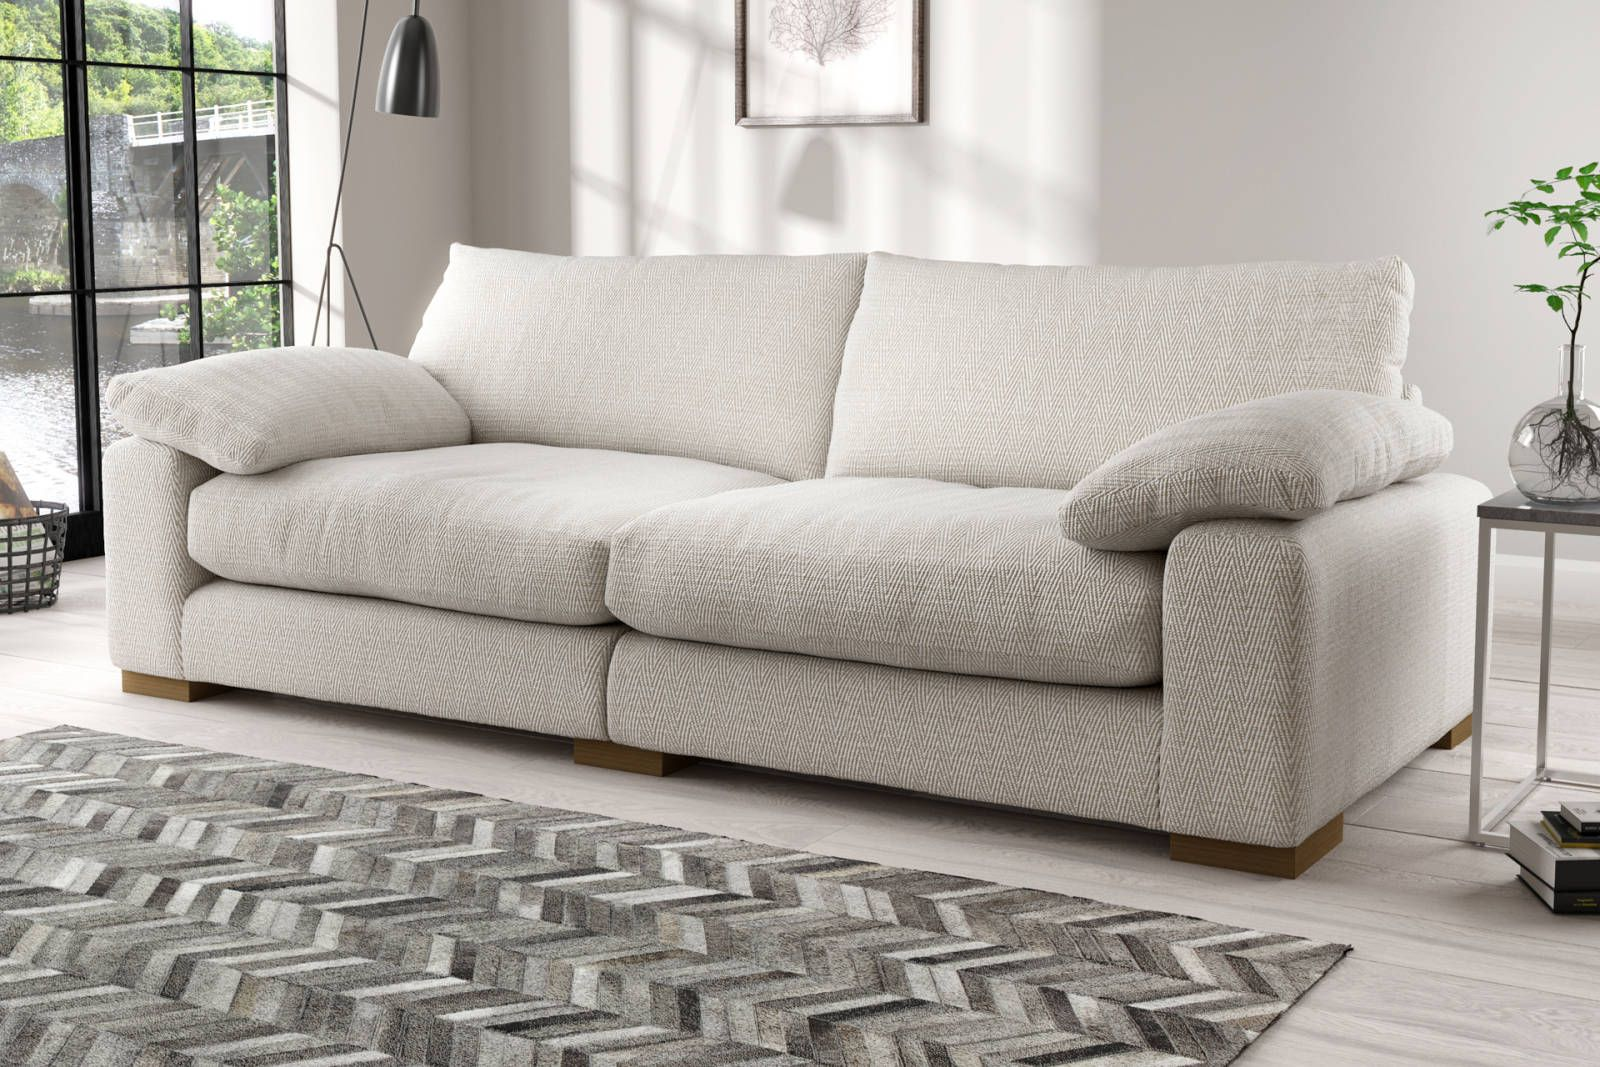 Coco Sofology 800 Ish Living Room Grey Fabric Sofa Lounge Suites